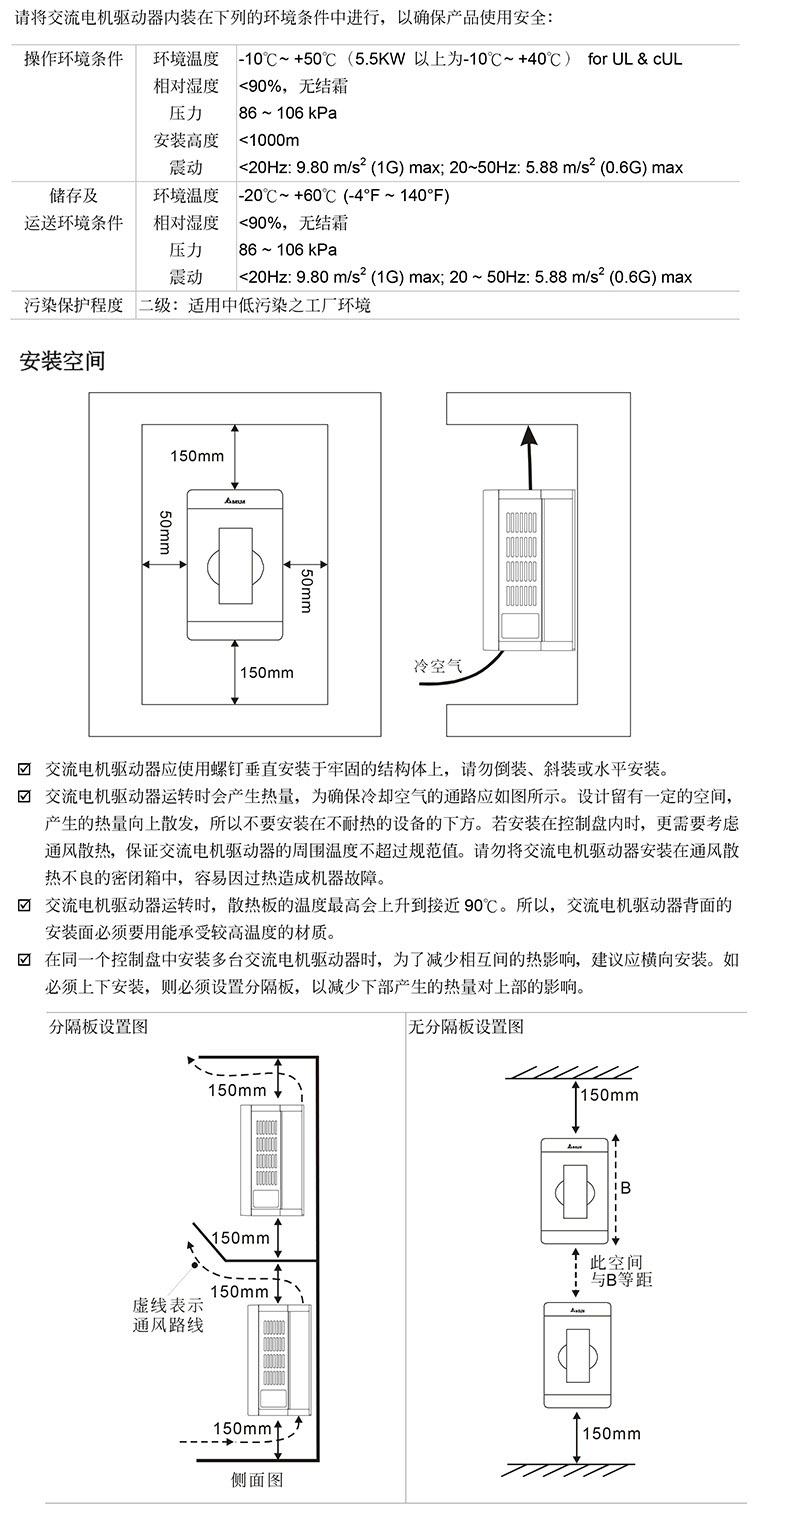 台达/delta vfd022m43b变频器